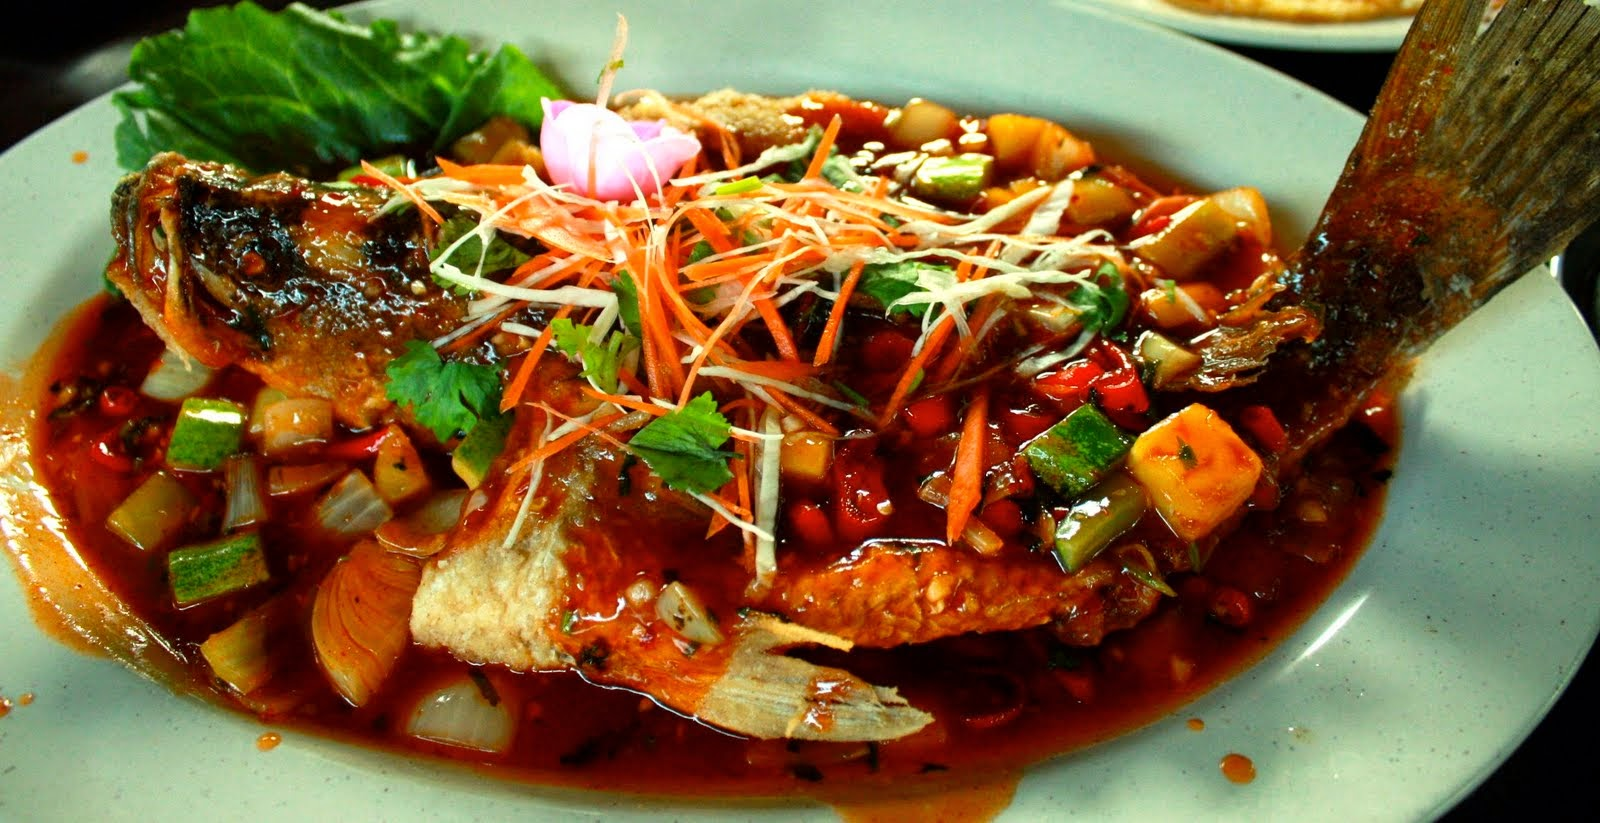 Chef Obie Kelas Masakan 1001 Info & Resepi: Resepi Ikan Kukus 3 Rasa Ramadhan Popular